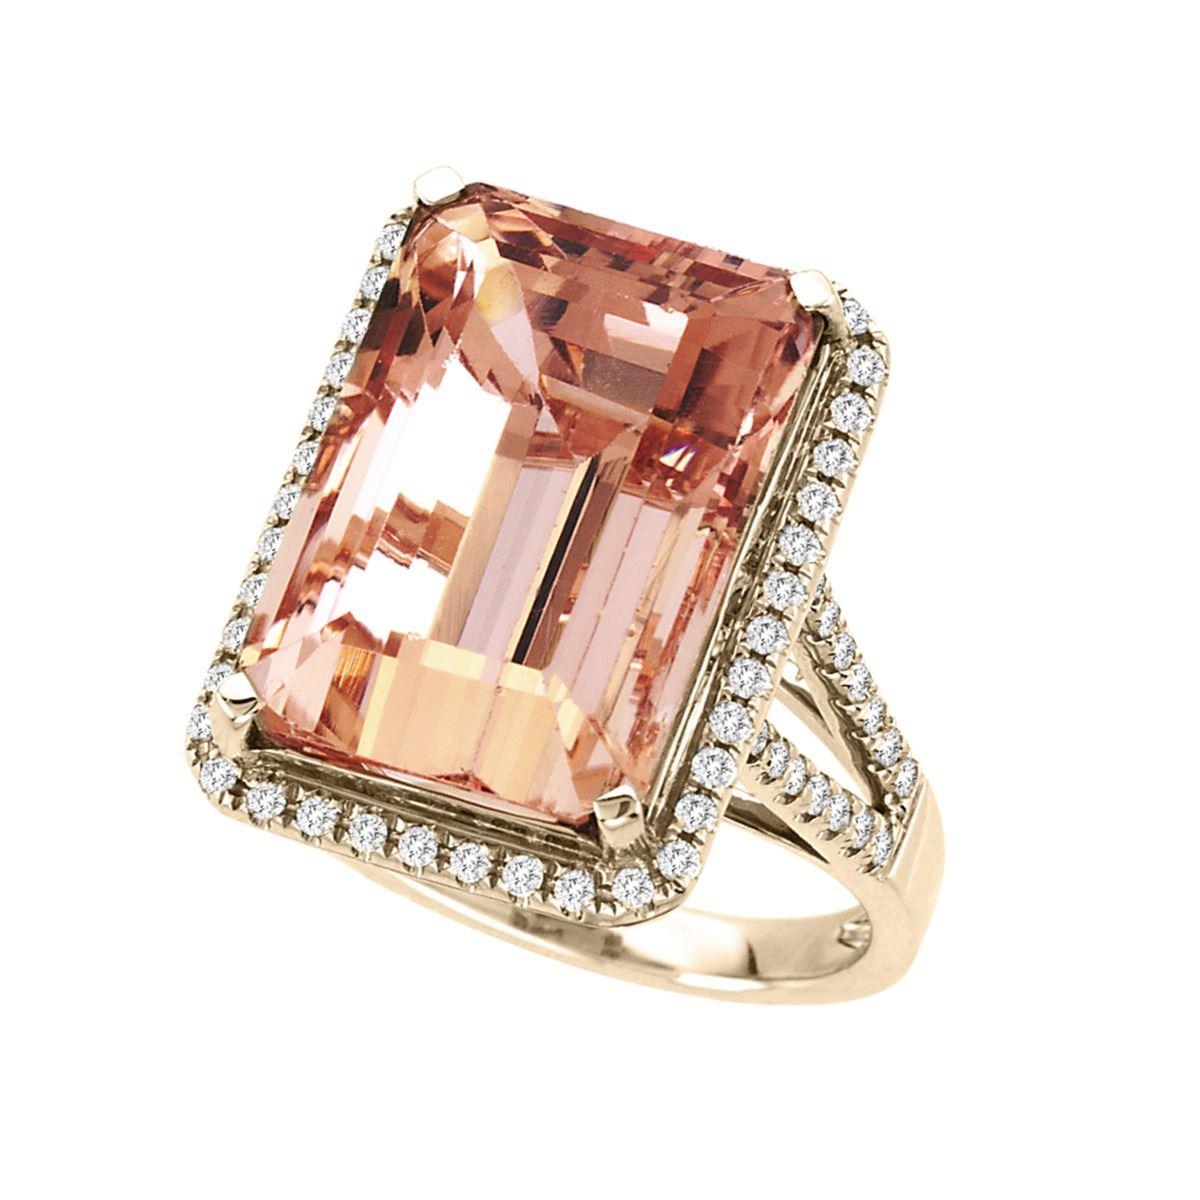 15 CARAT MORGANITE & DIAMOND RING